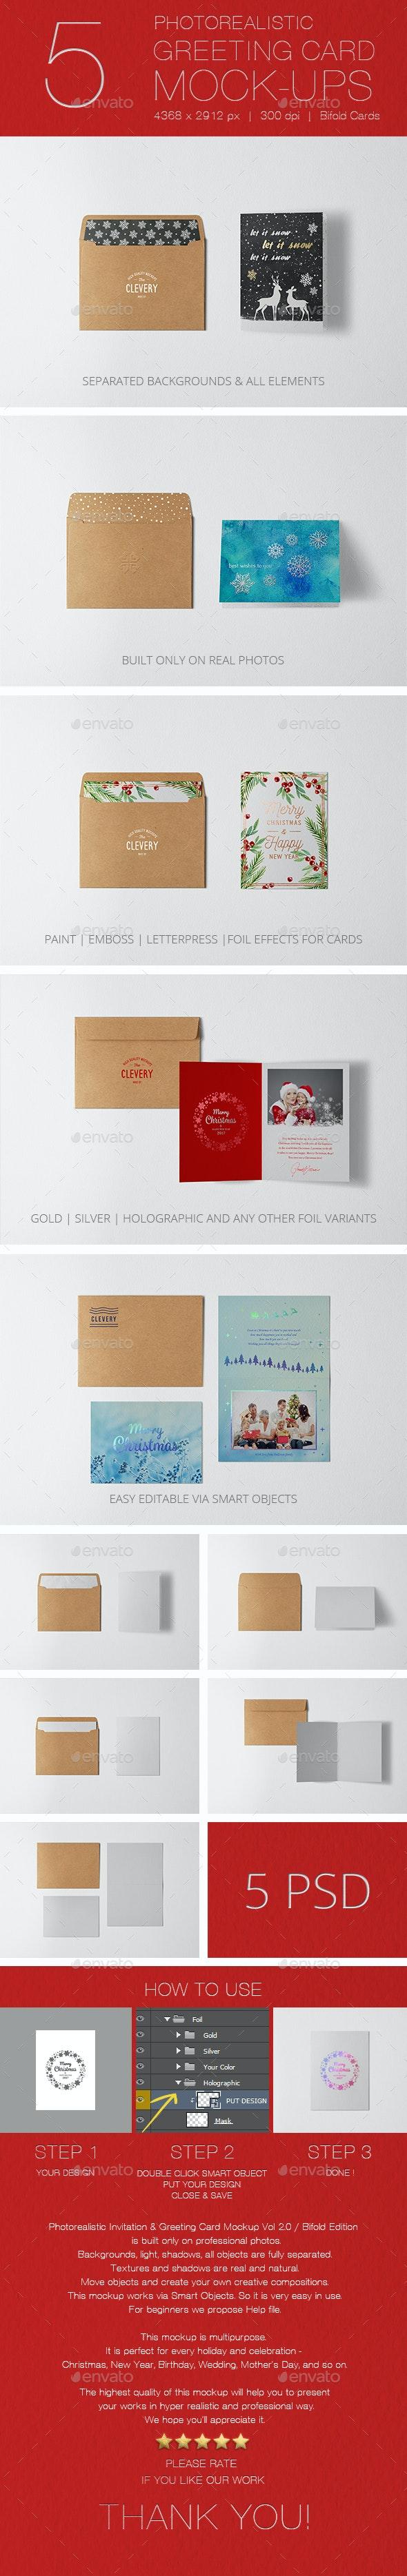 Photorealistic Invitation & Greeting Card Mockup Vol 2.0 / Bifold Edition - Miscellaneous Print